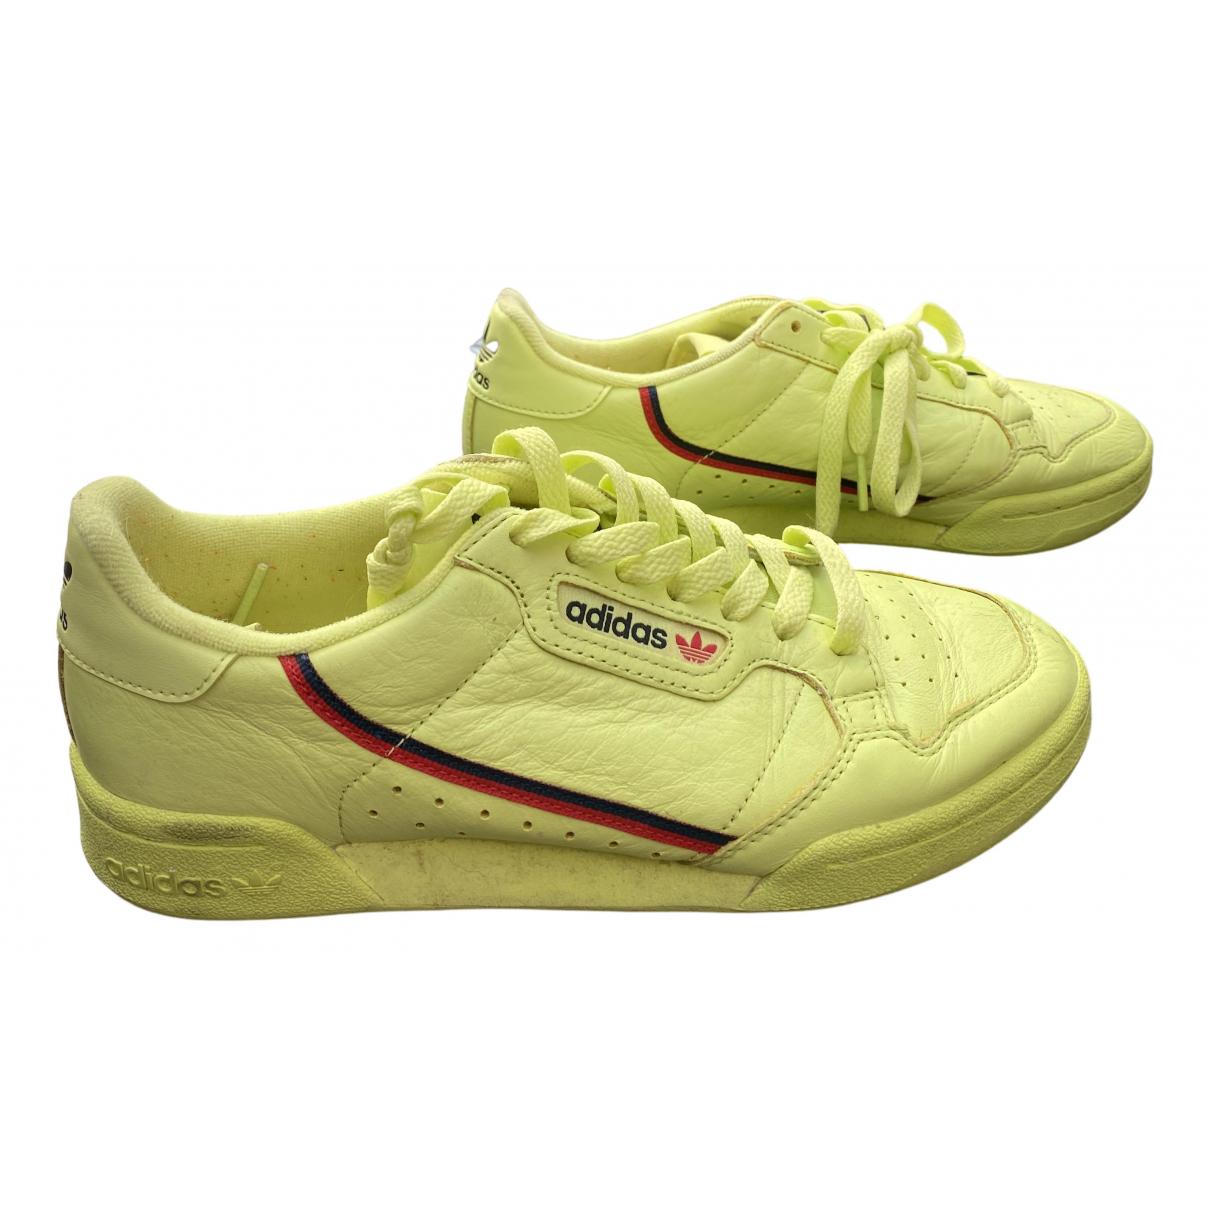 Adidas Continental 80 Sneakers in  Gruen Leder